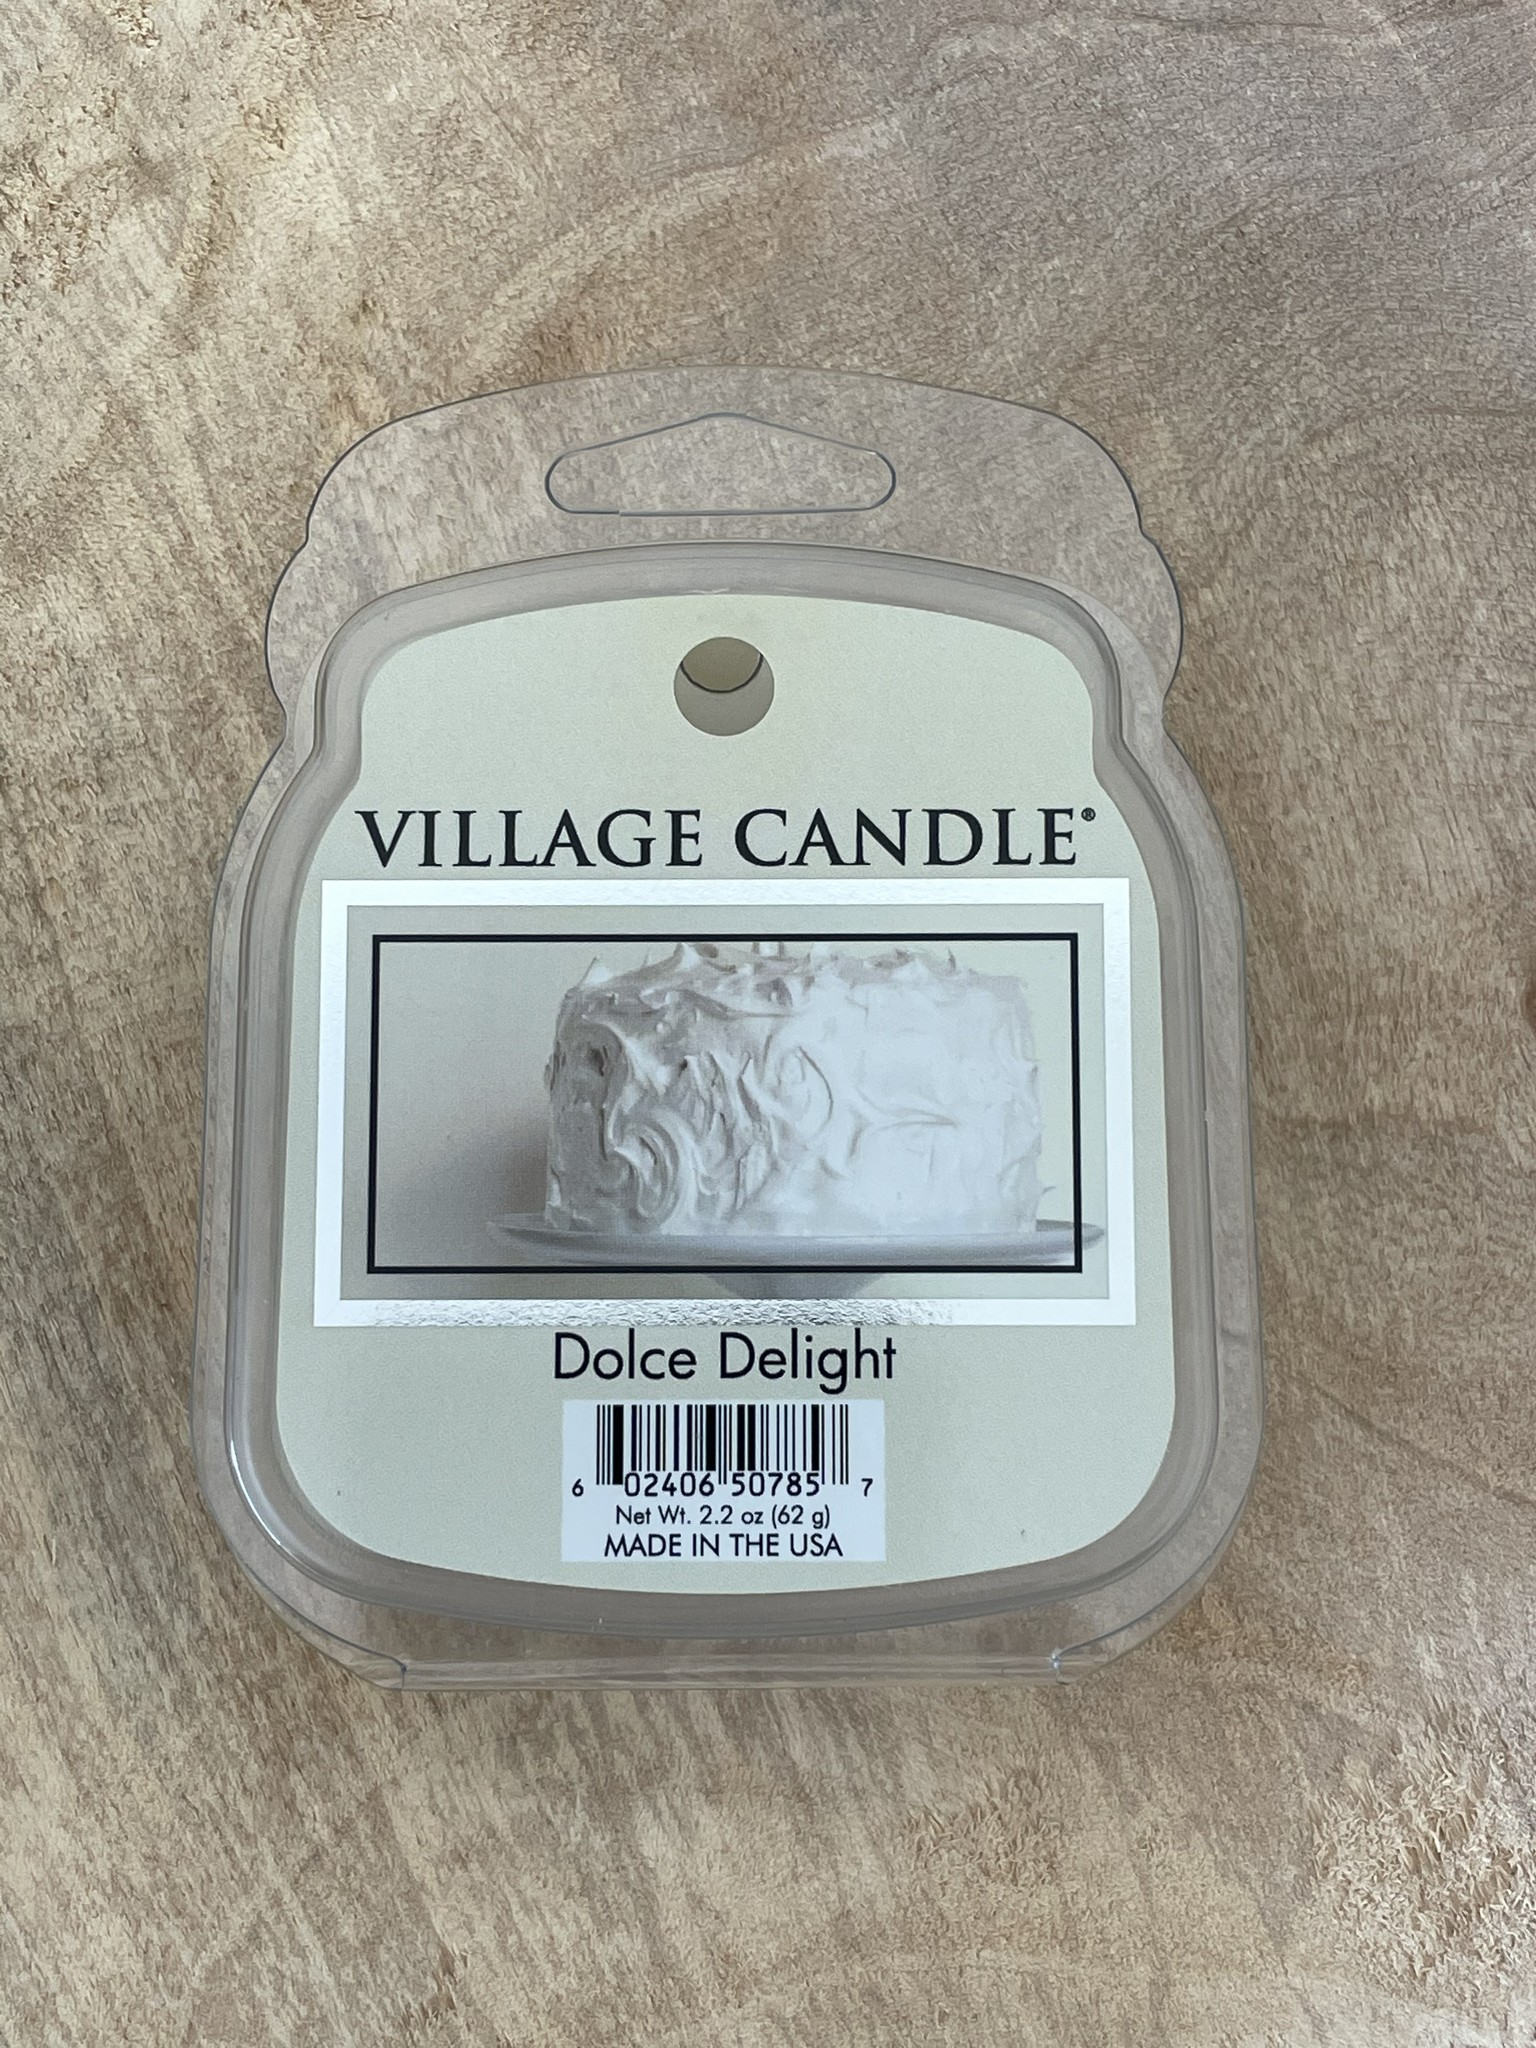 Village Candle Village Candle Dolce Delight Wax Melt